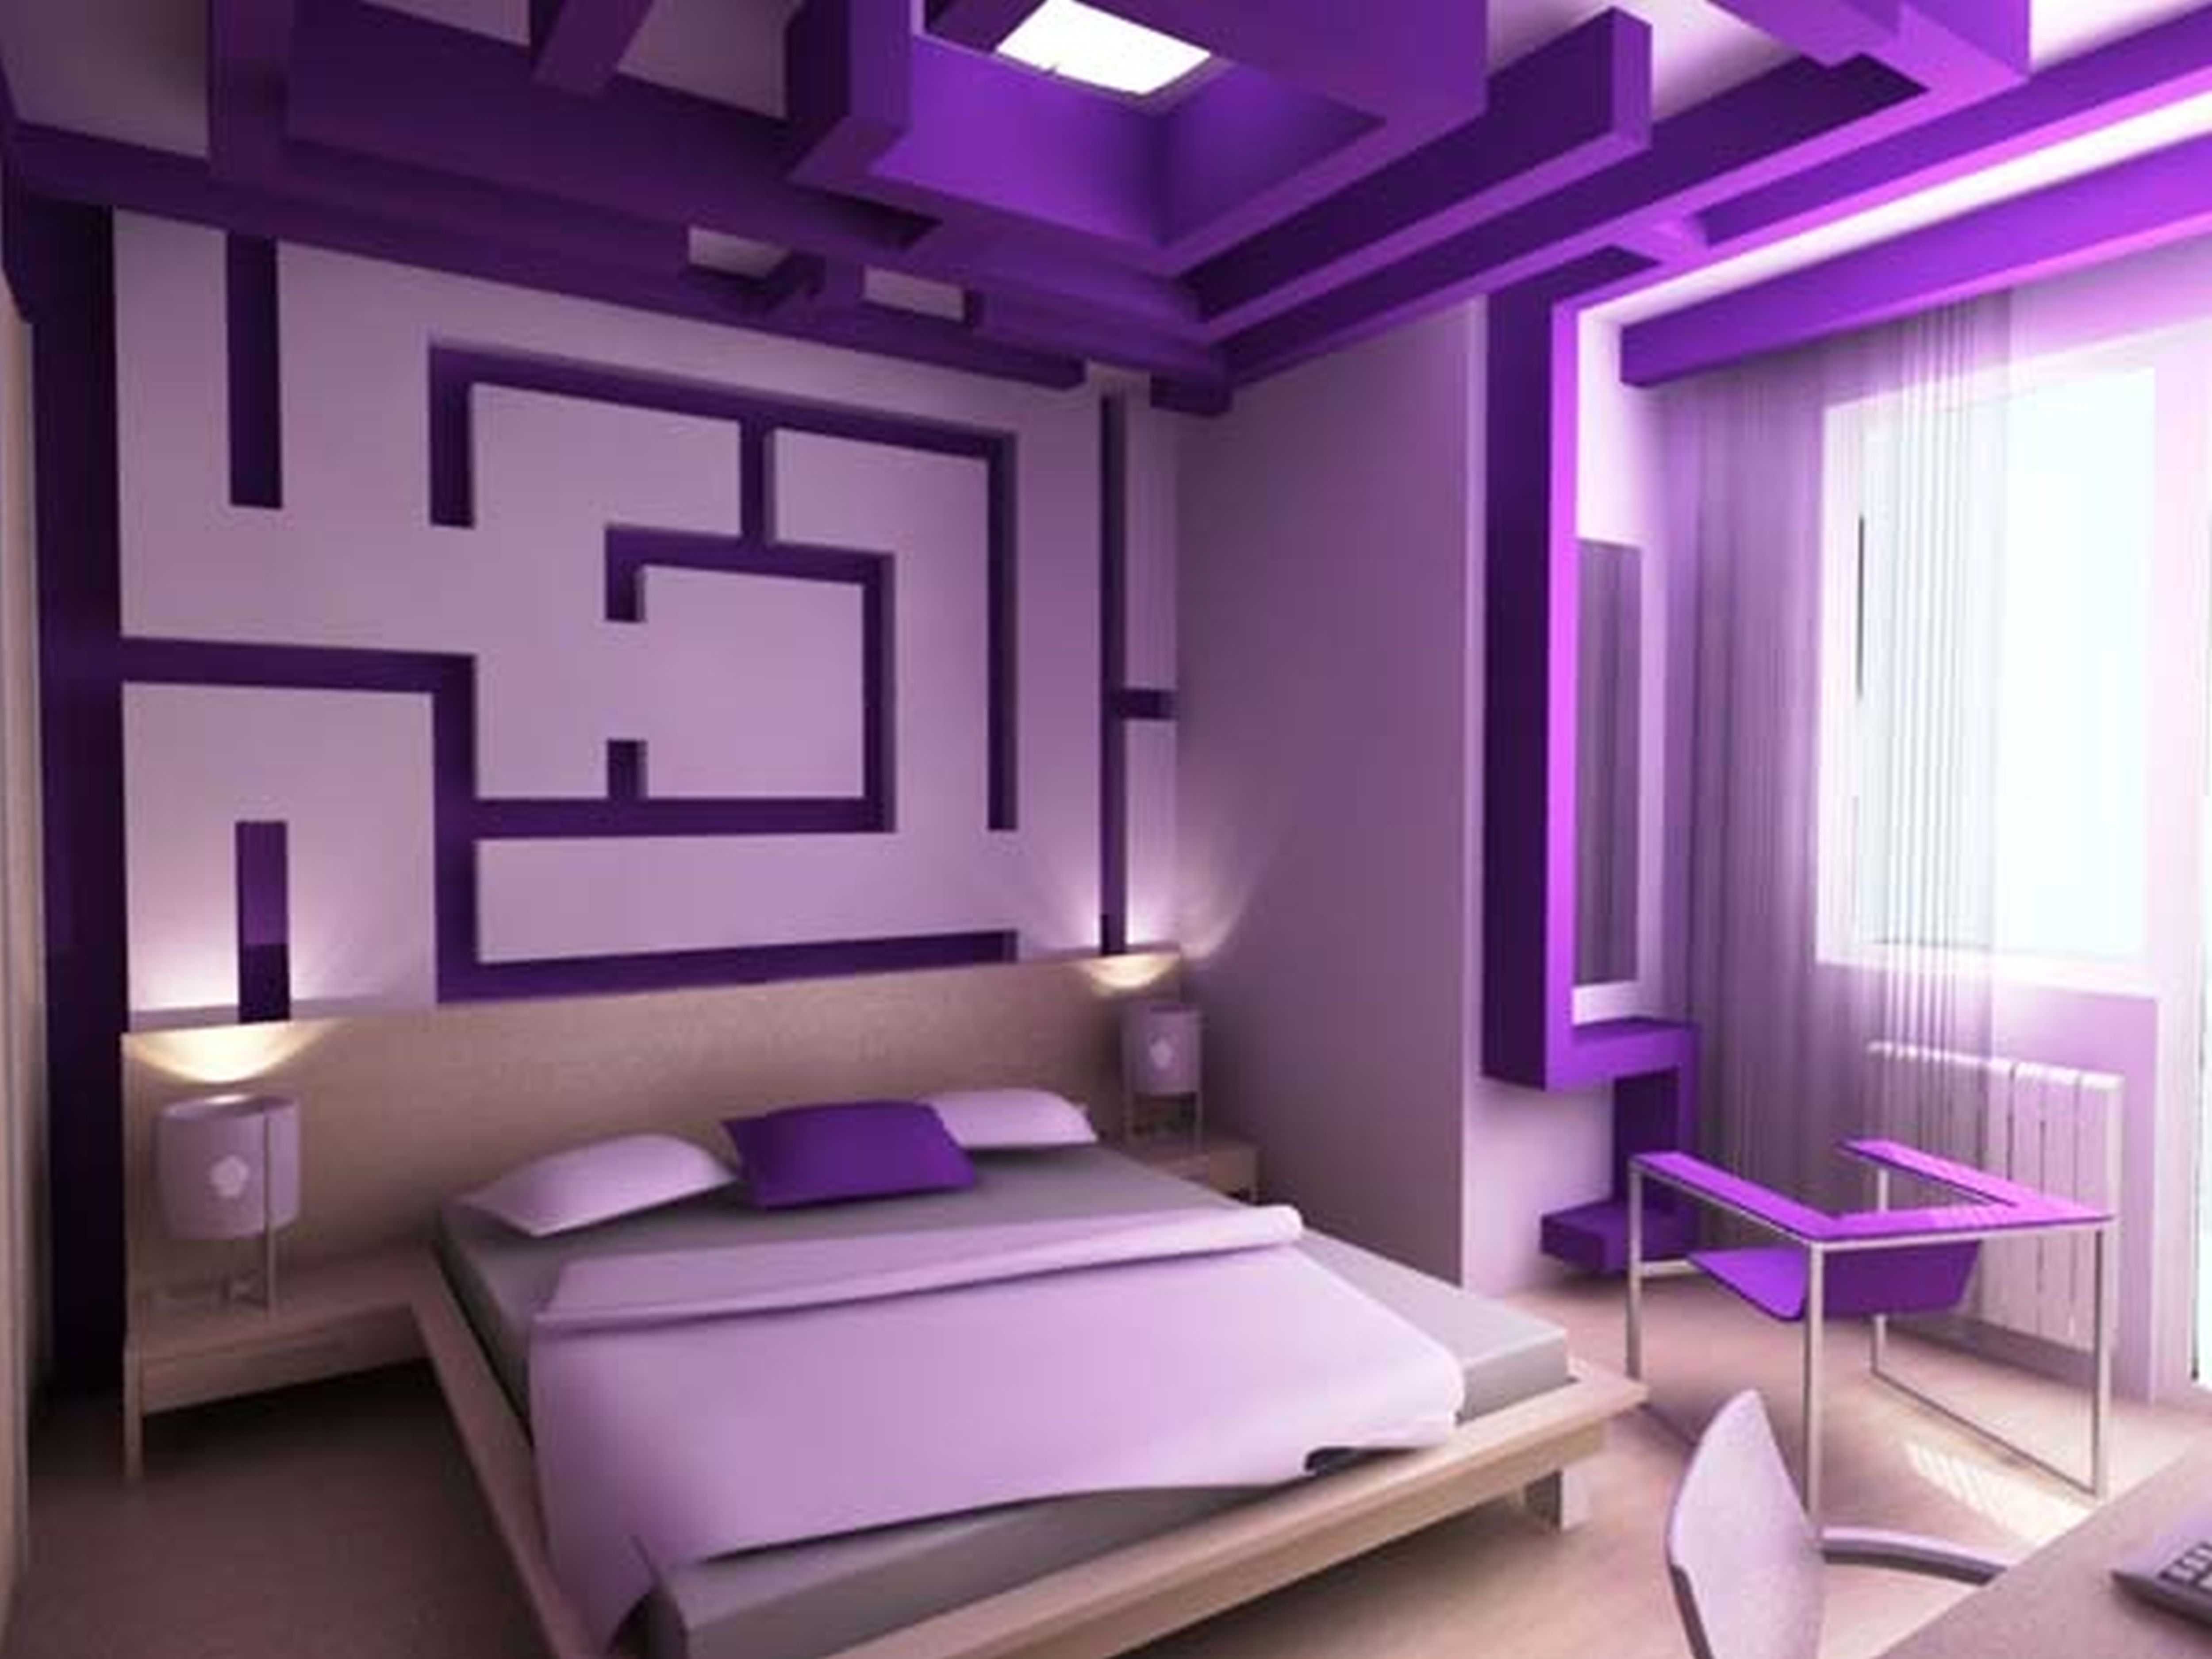 Bedroom Neon Paint Colors For Bedrooms Design Ideas Purple